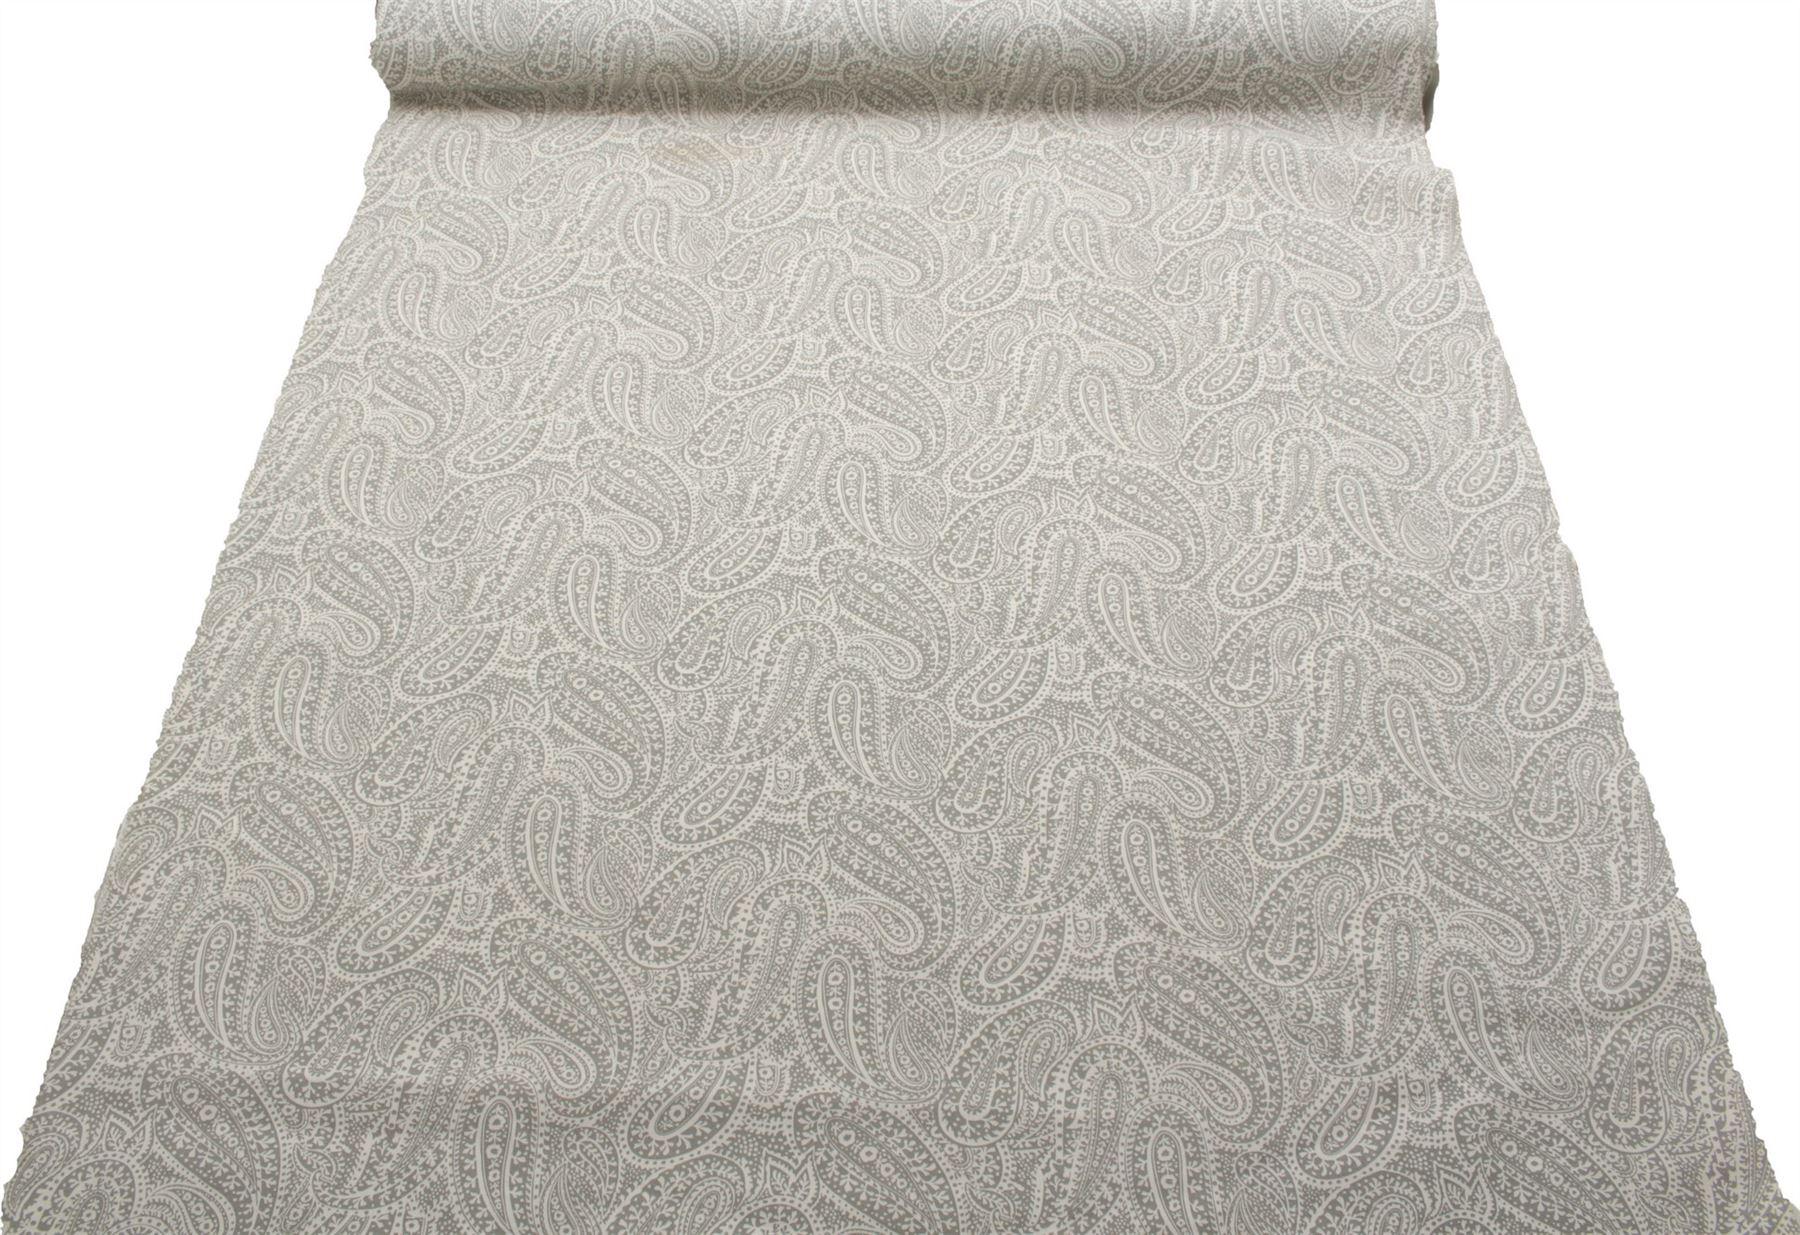 thumbnail 8 - 100% Heavy Cotton Panama Printed Childrens Curtain Cushion Upholstery Fabric